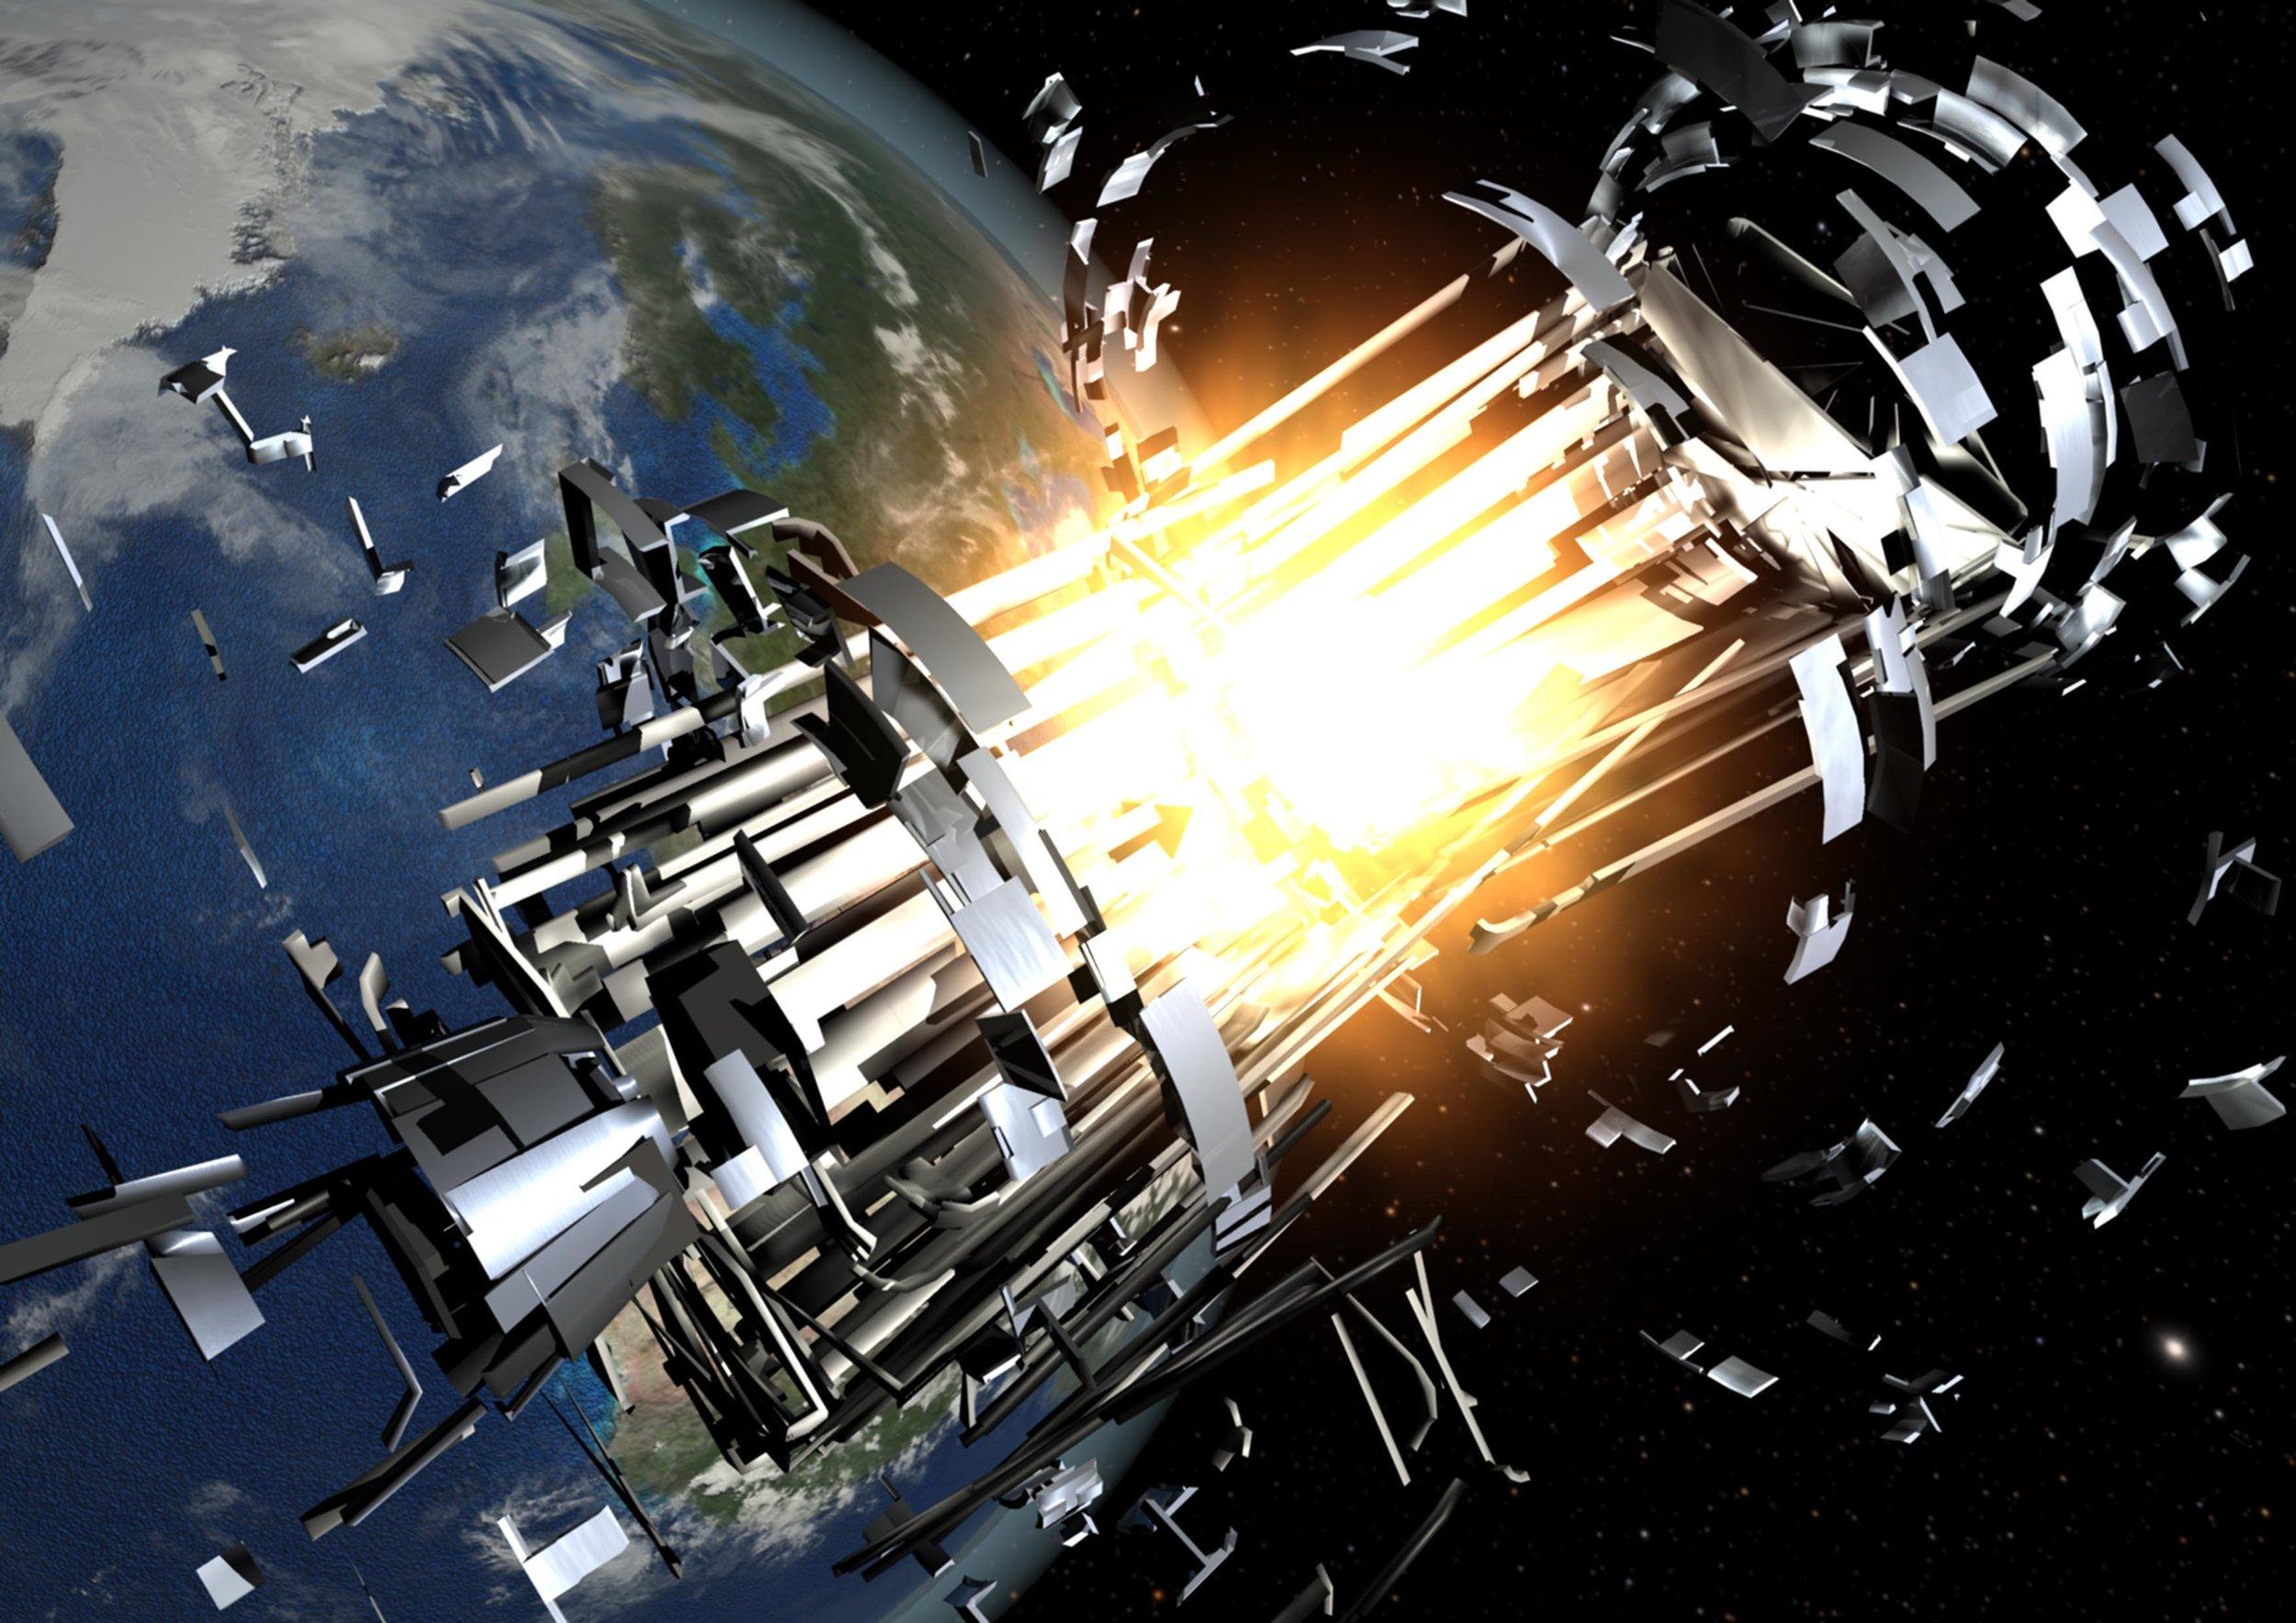 Sources of space debris include explosions of rocket bodies. - Image Credit: ESA